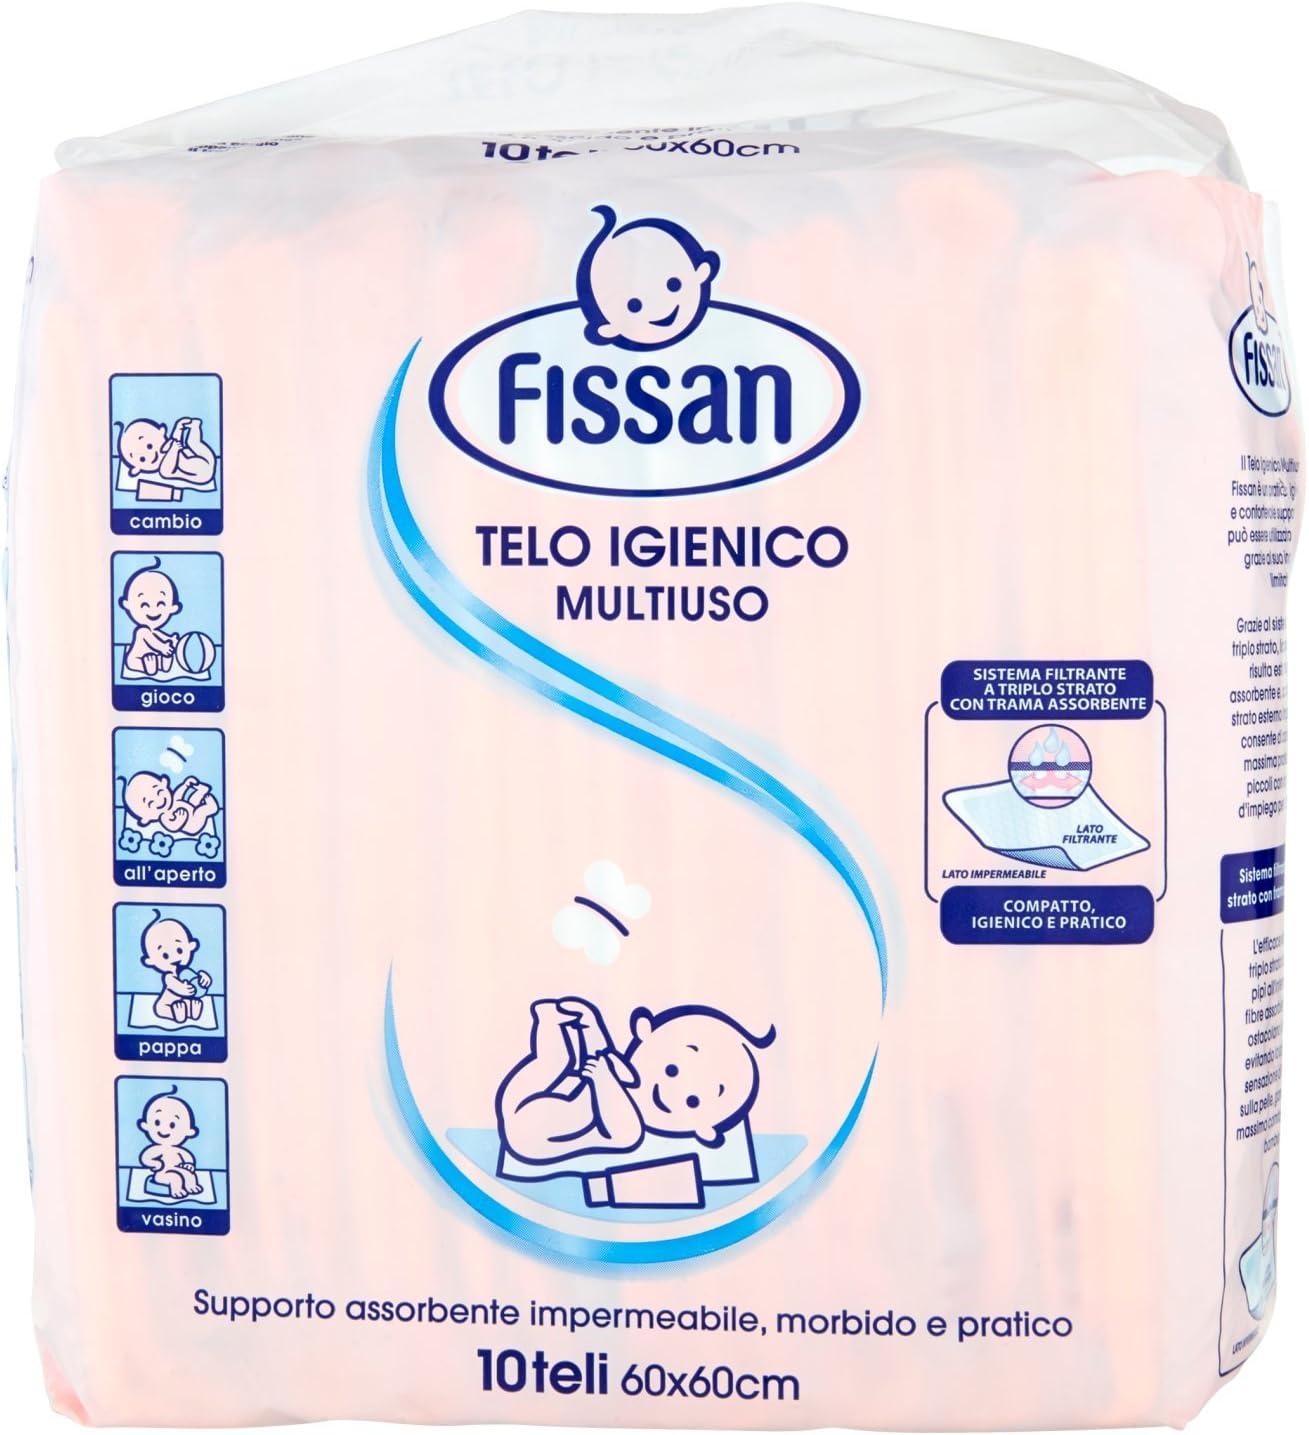 OFFERTA: Il TELO IGIENICO FISSAN BABY